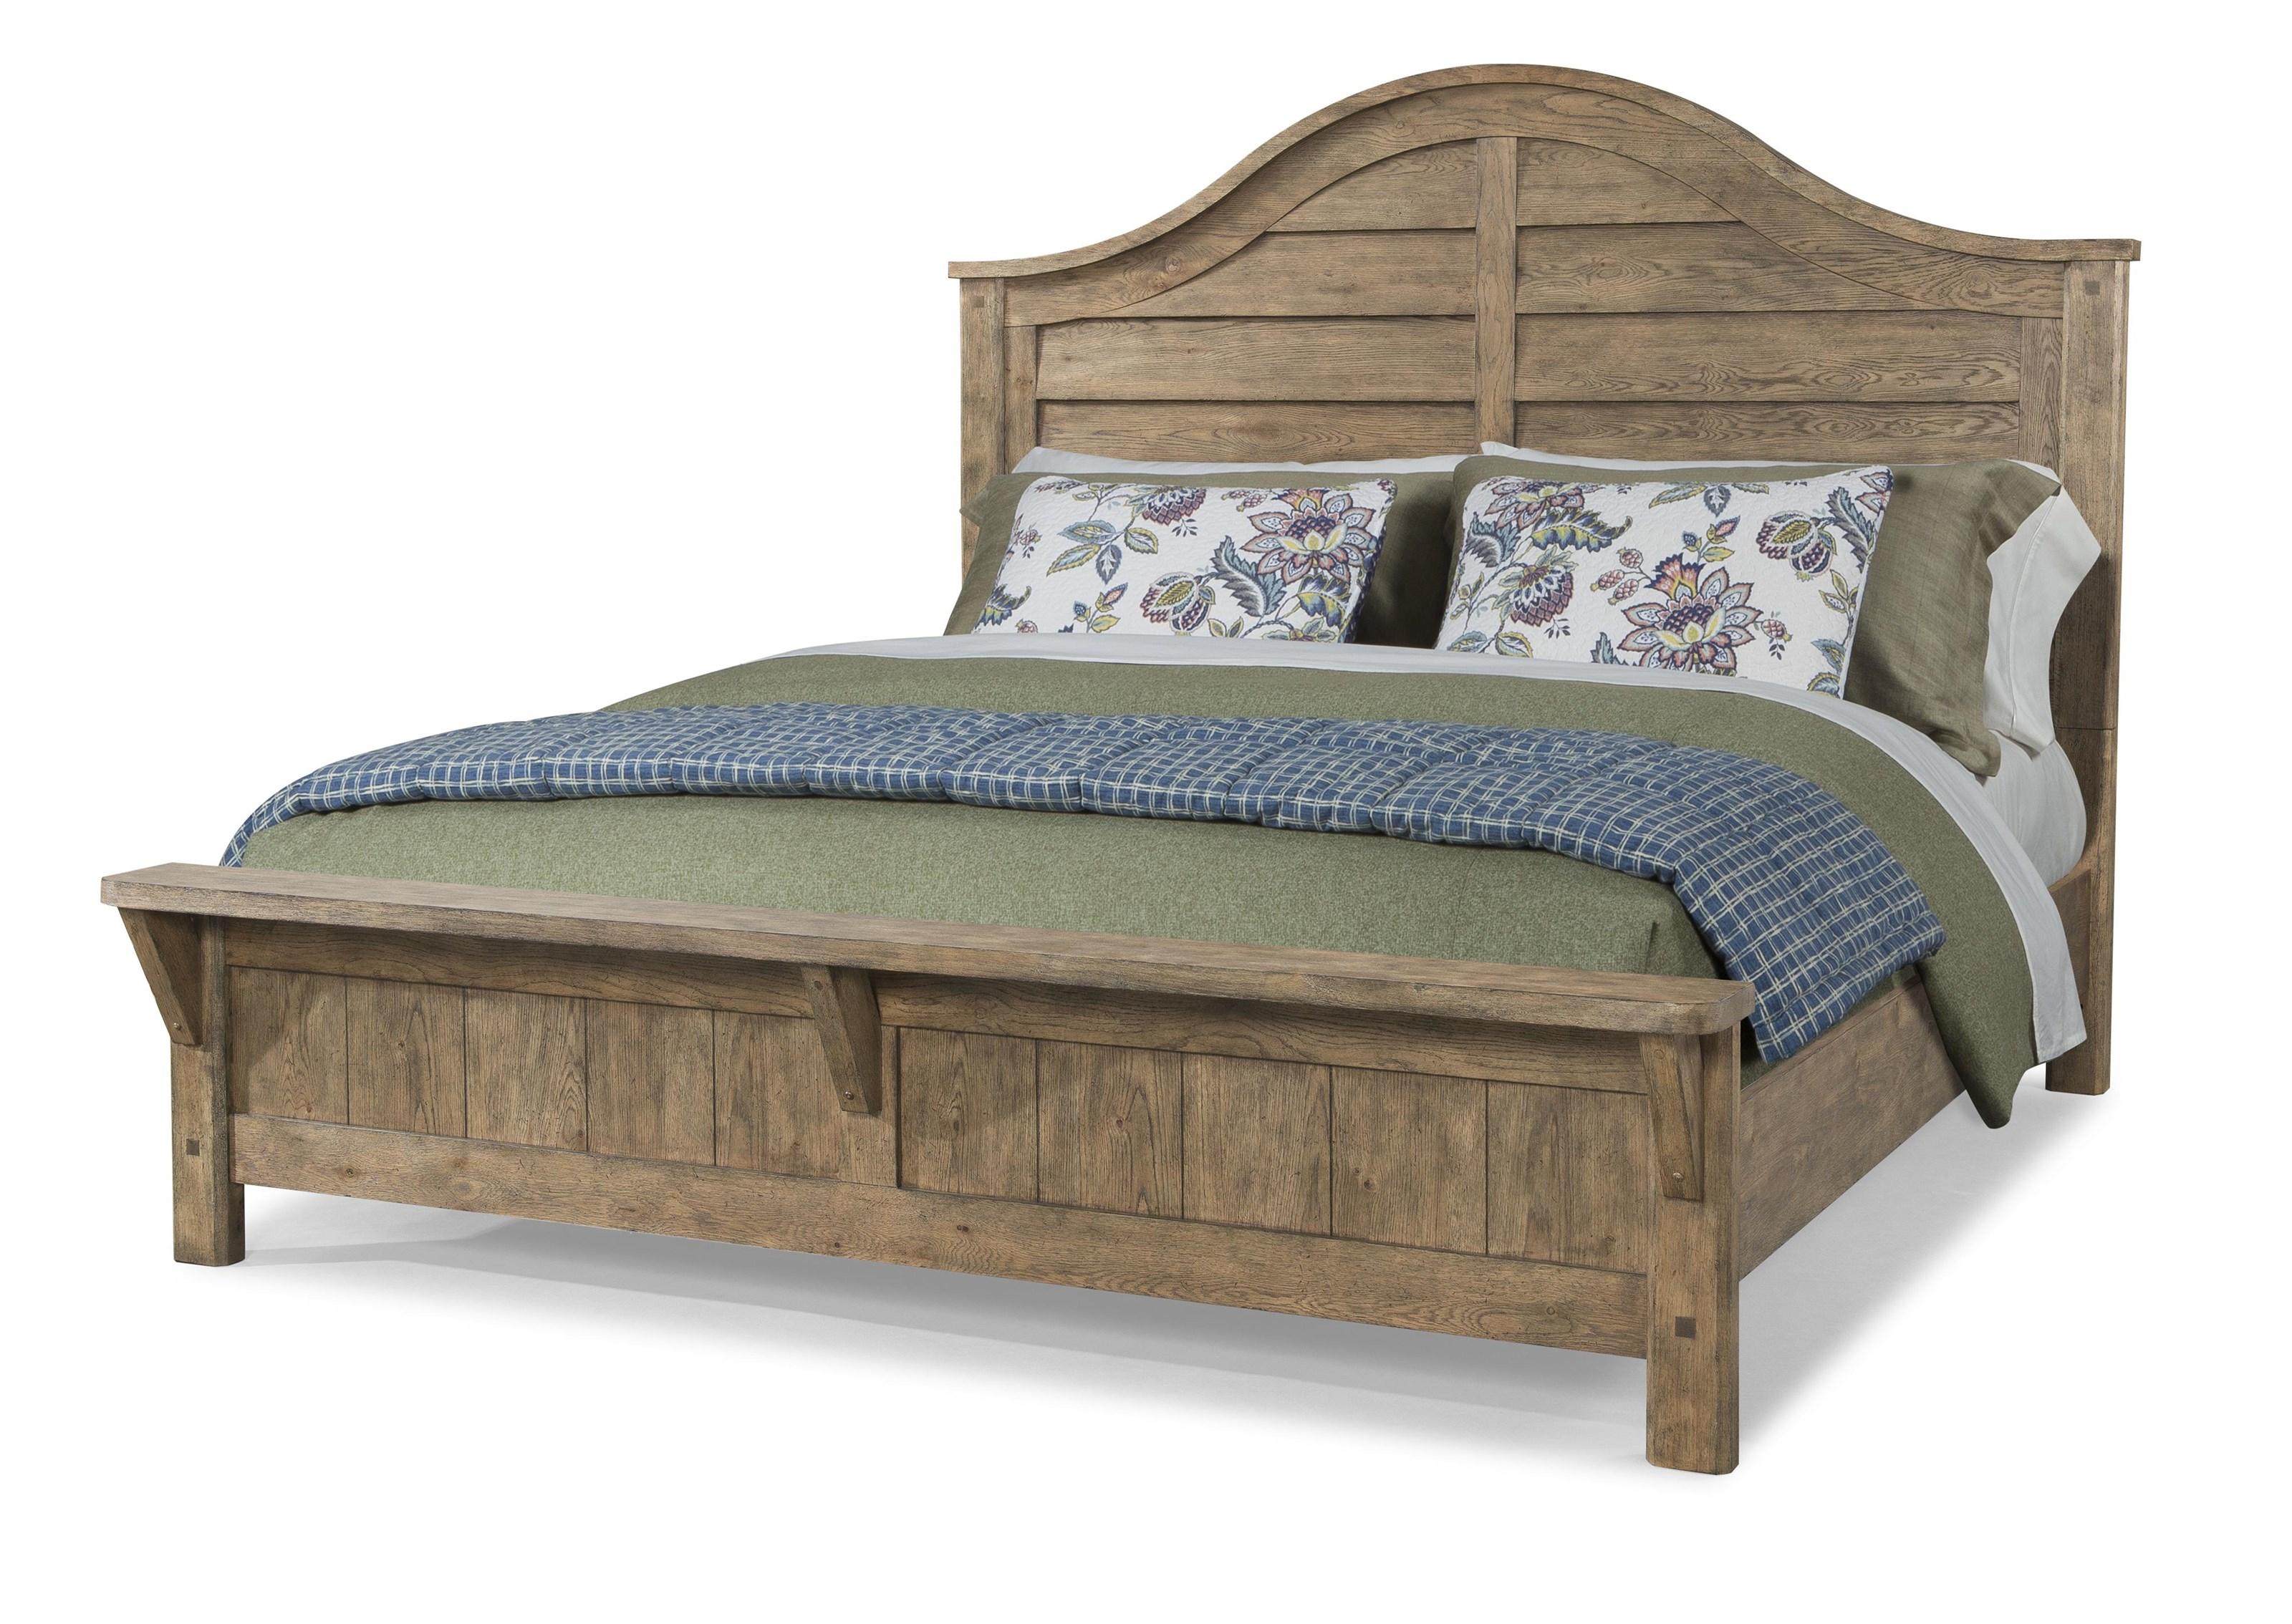 Morris Home Furnishings River Falls River Falls Queen Bed - Item Number: 642023296